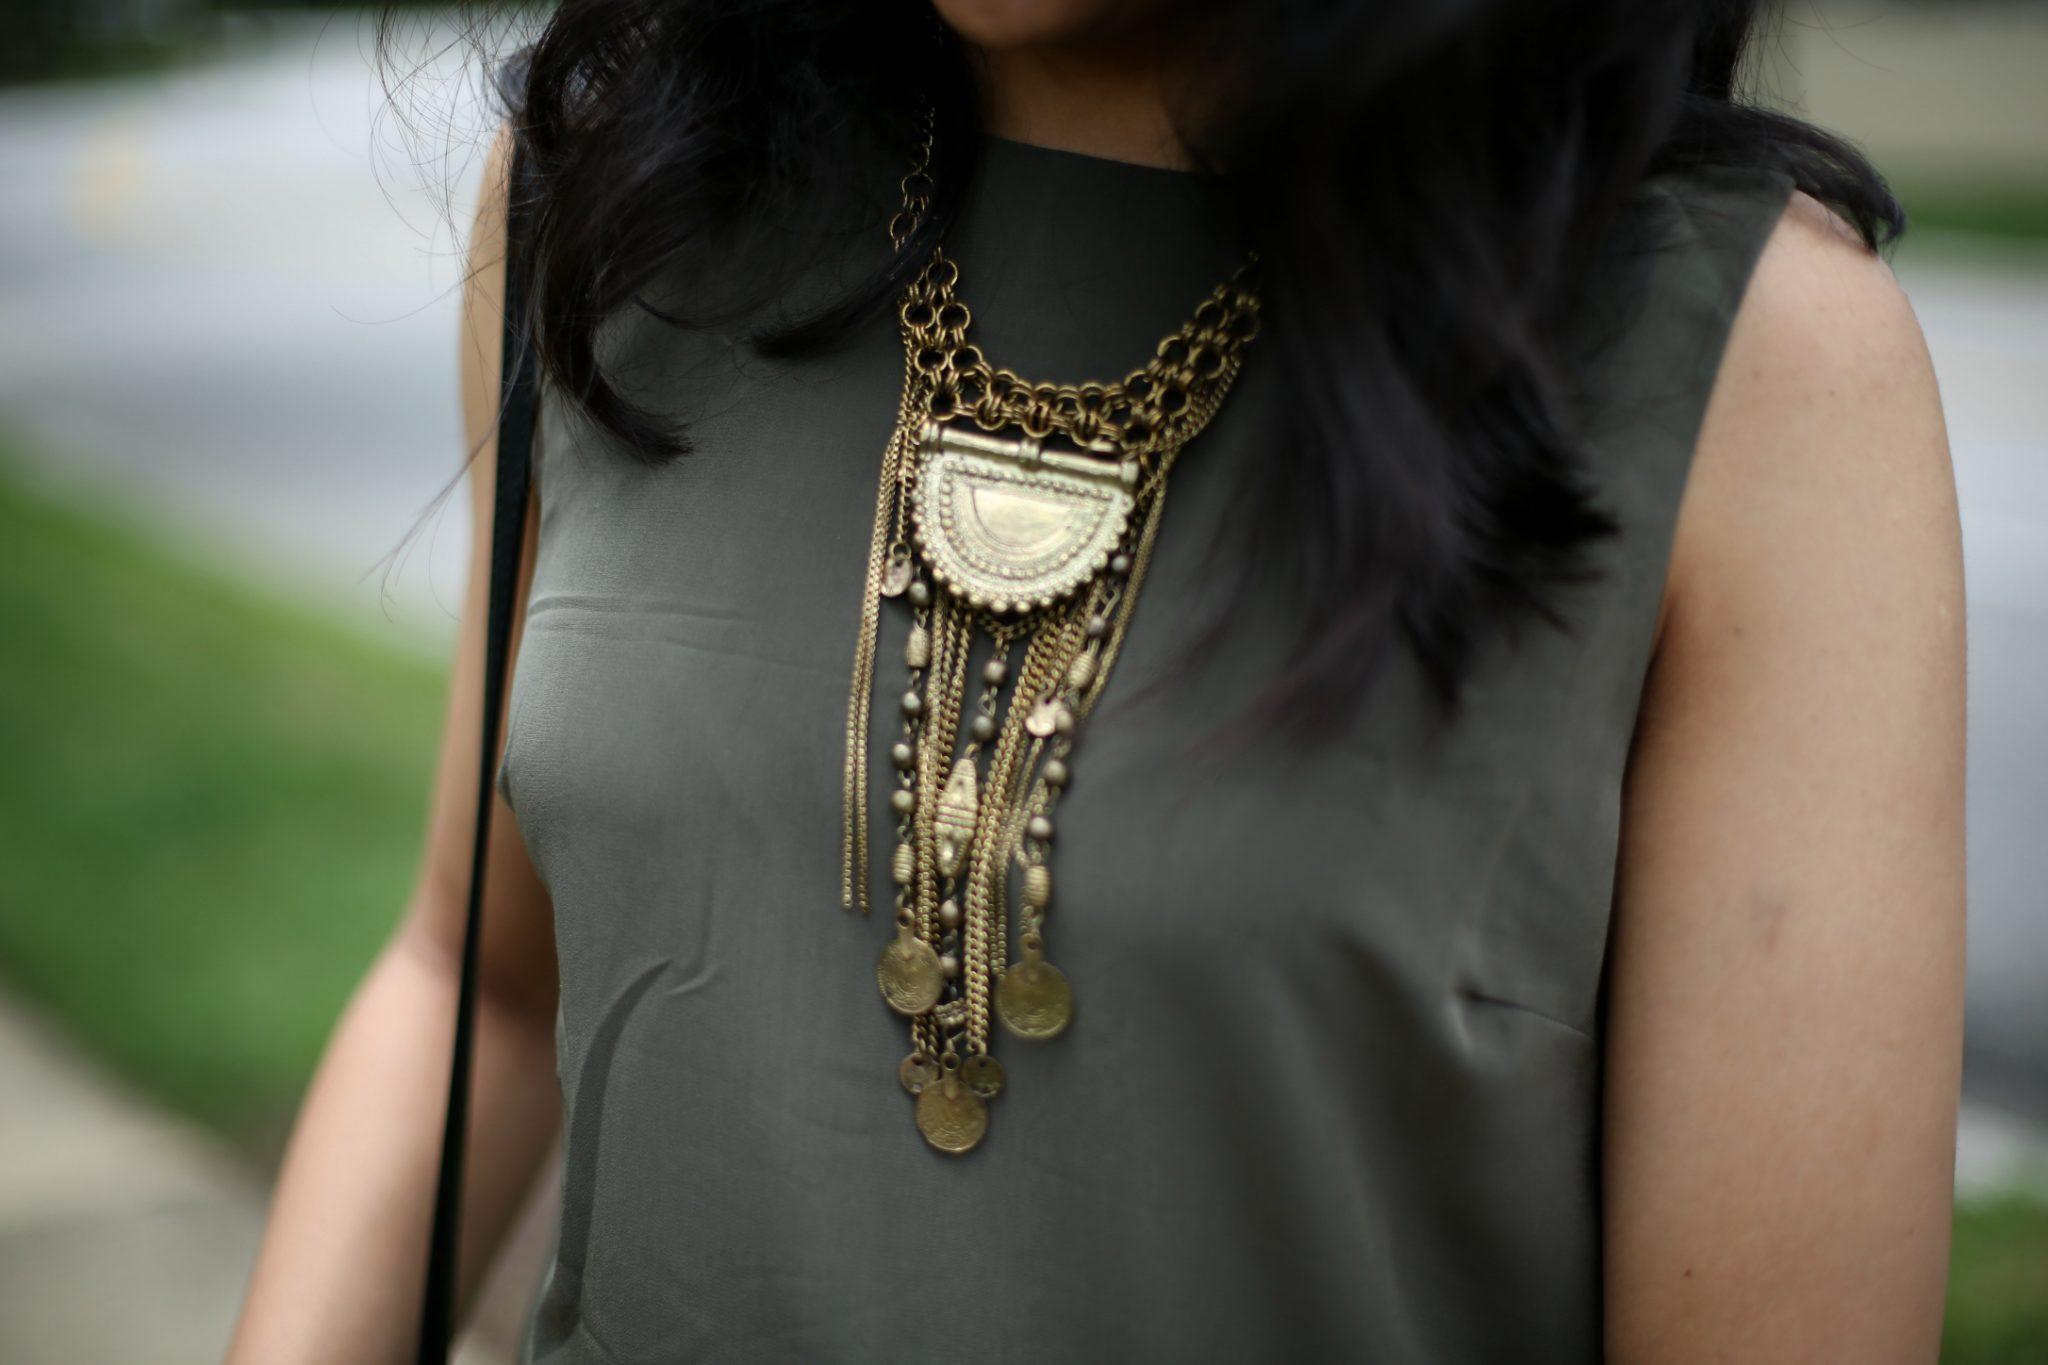 free-people-boho-necklace-dlfree-people-boho-necklace-dl